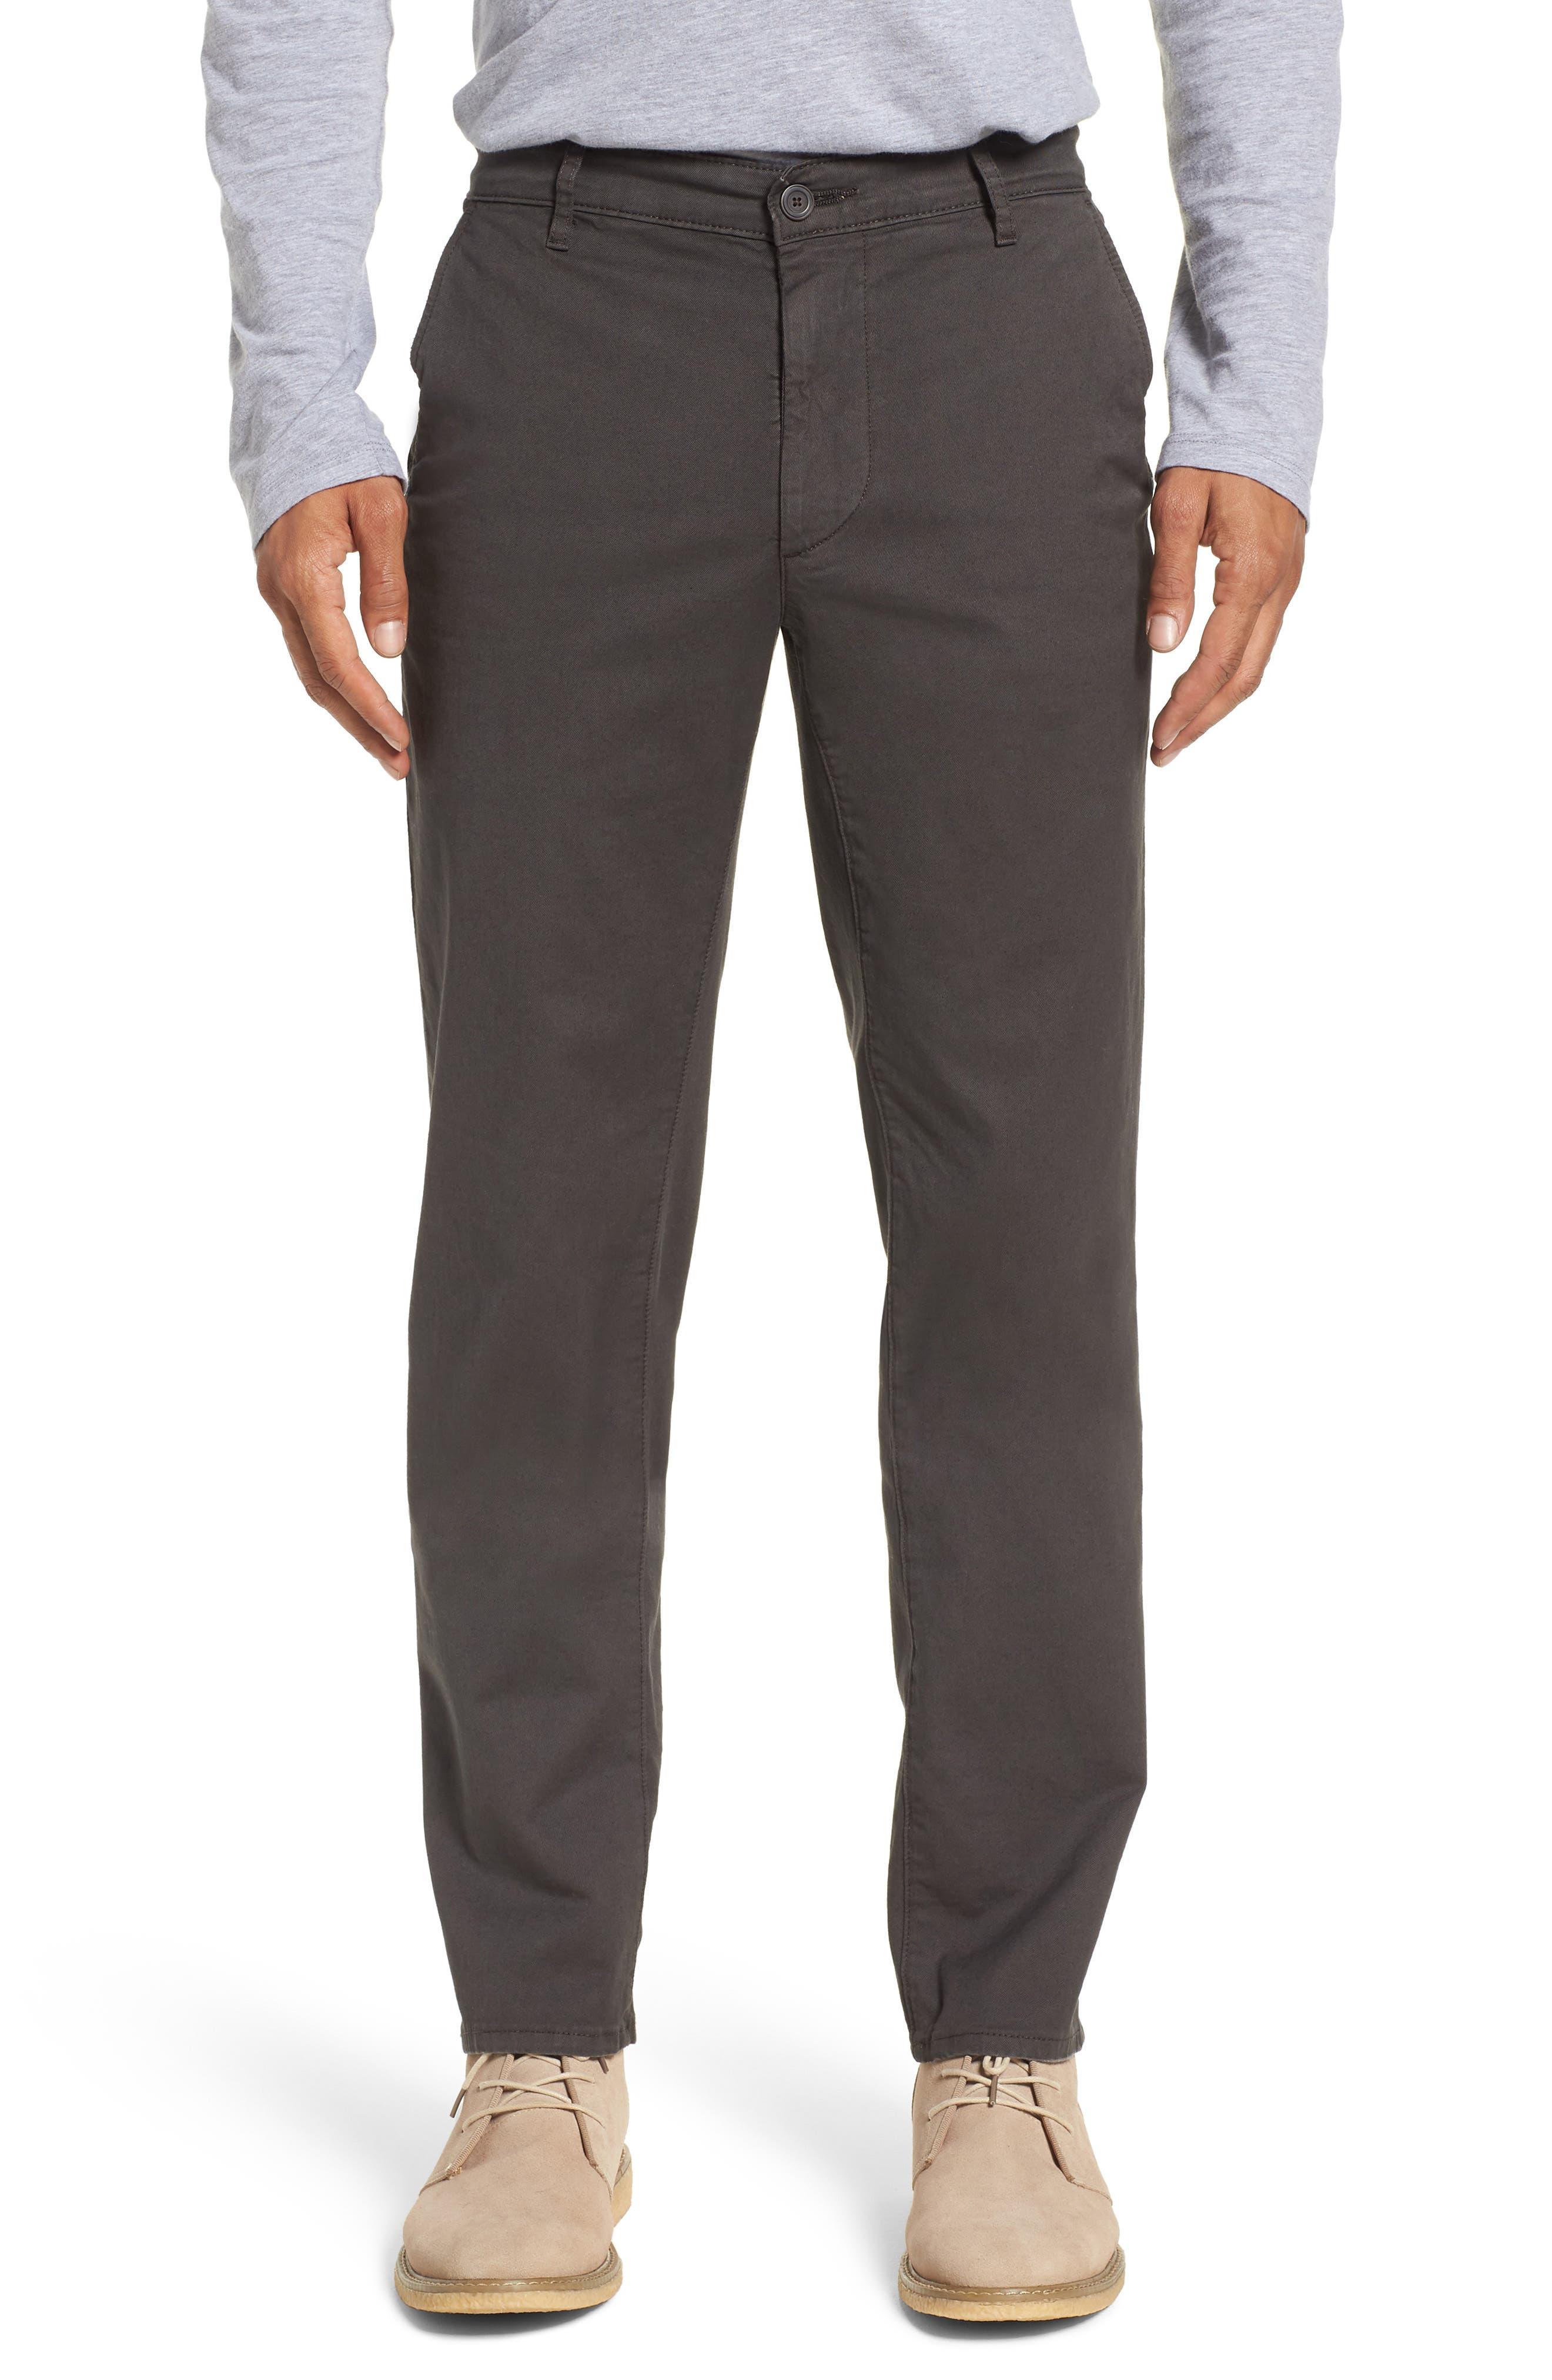 Marshall Slim Straight Leg Chino Pants,                             Main thumbnail 1, color,                             039